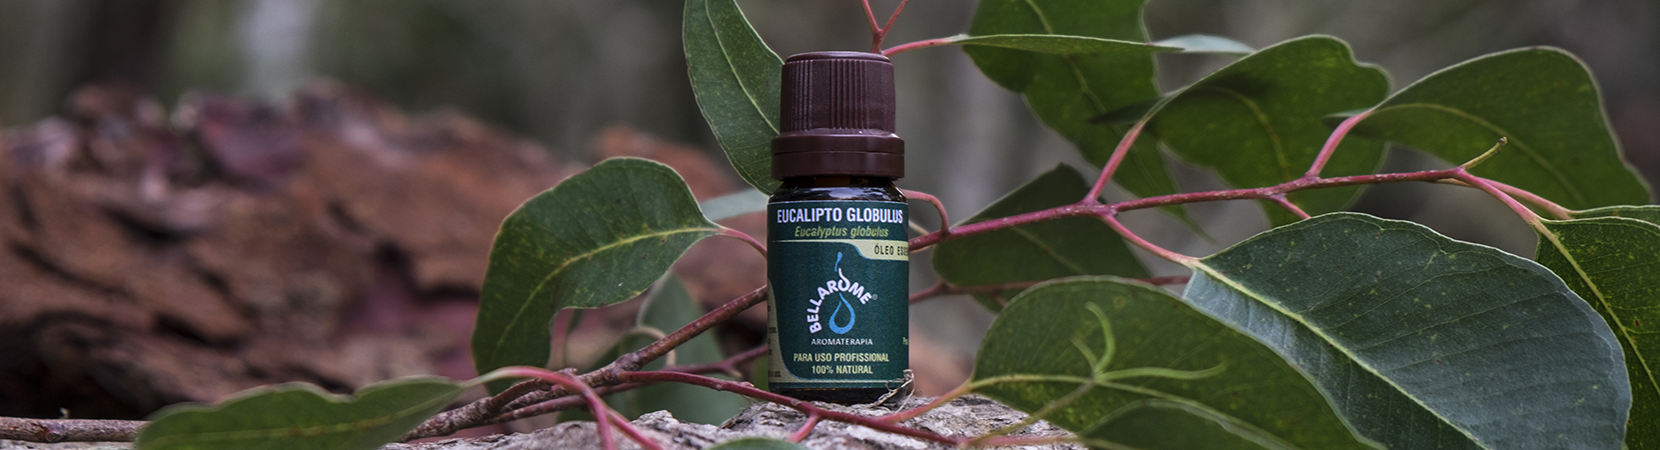 Óleos essenciais bellarome eucalipto